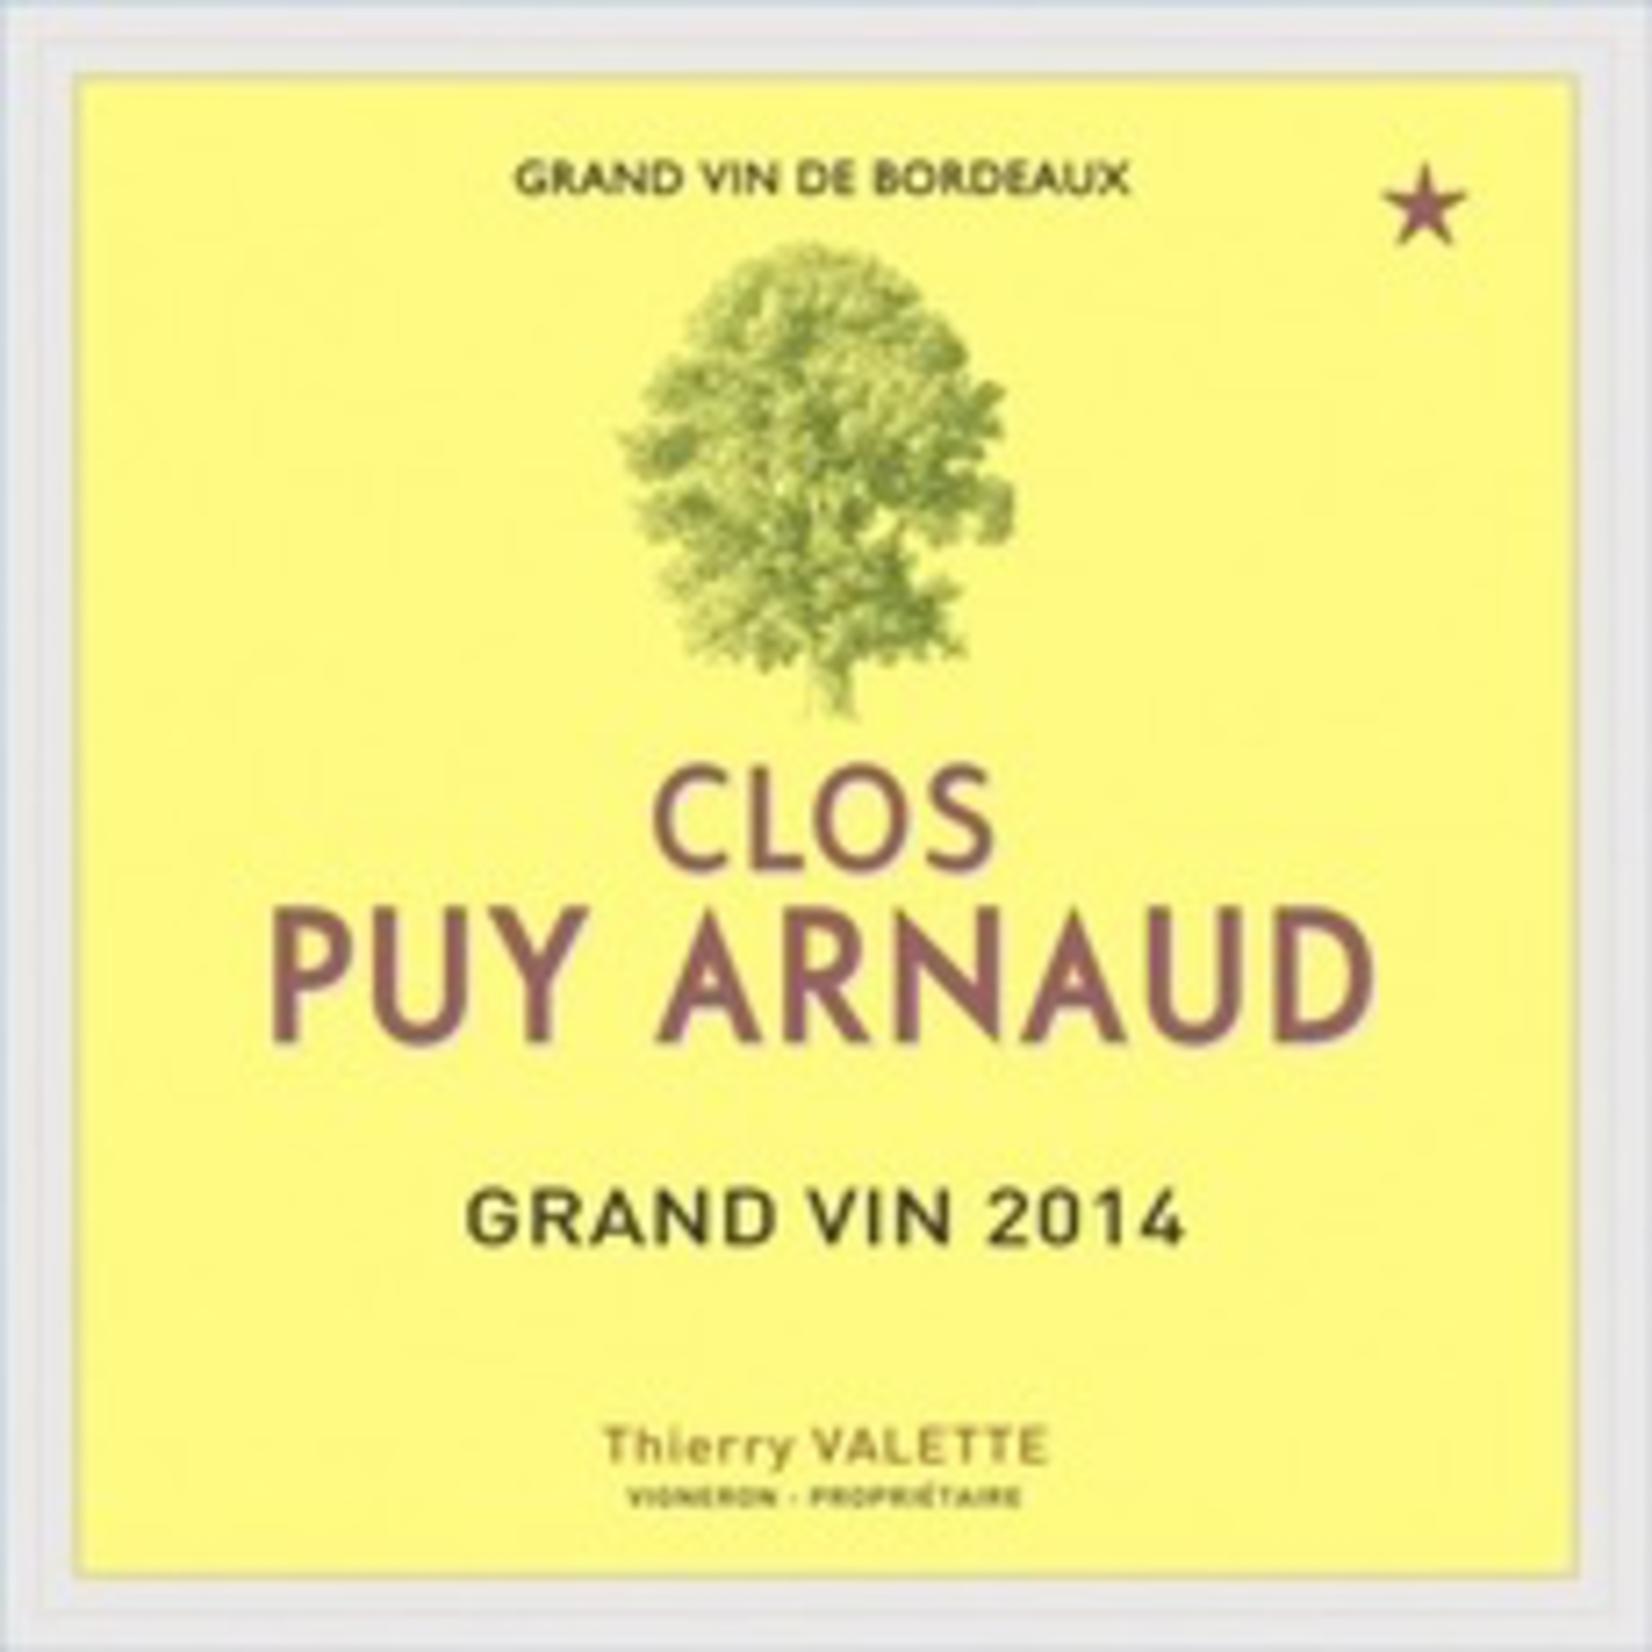 Wine Clos Puy Arnaud 2014